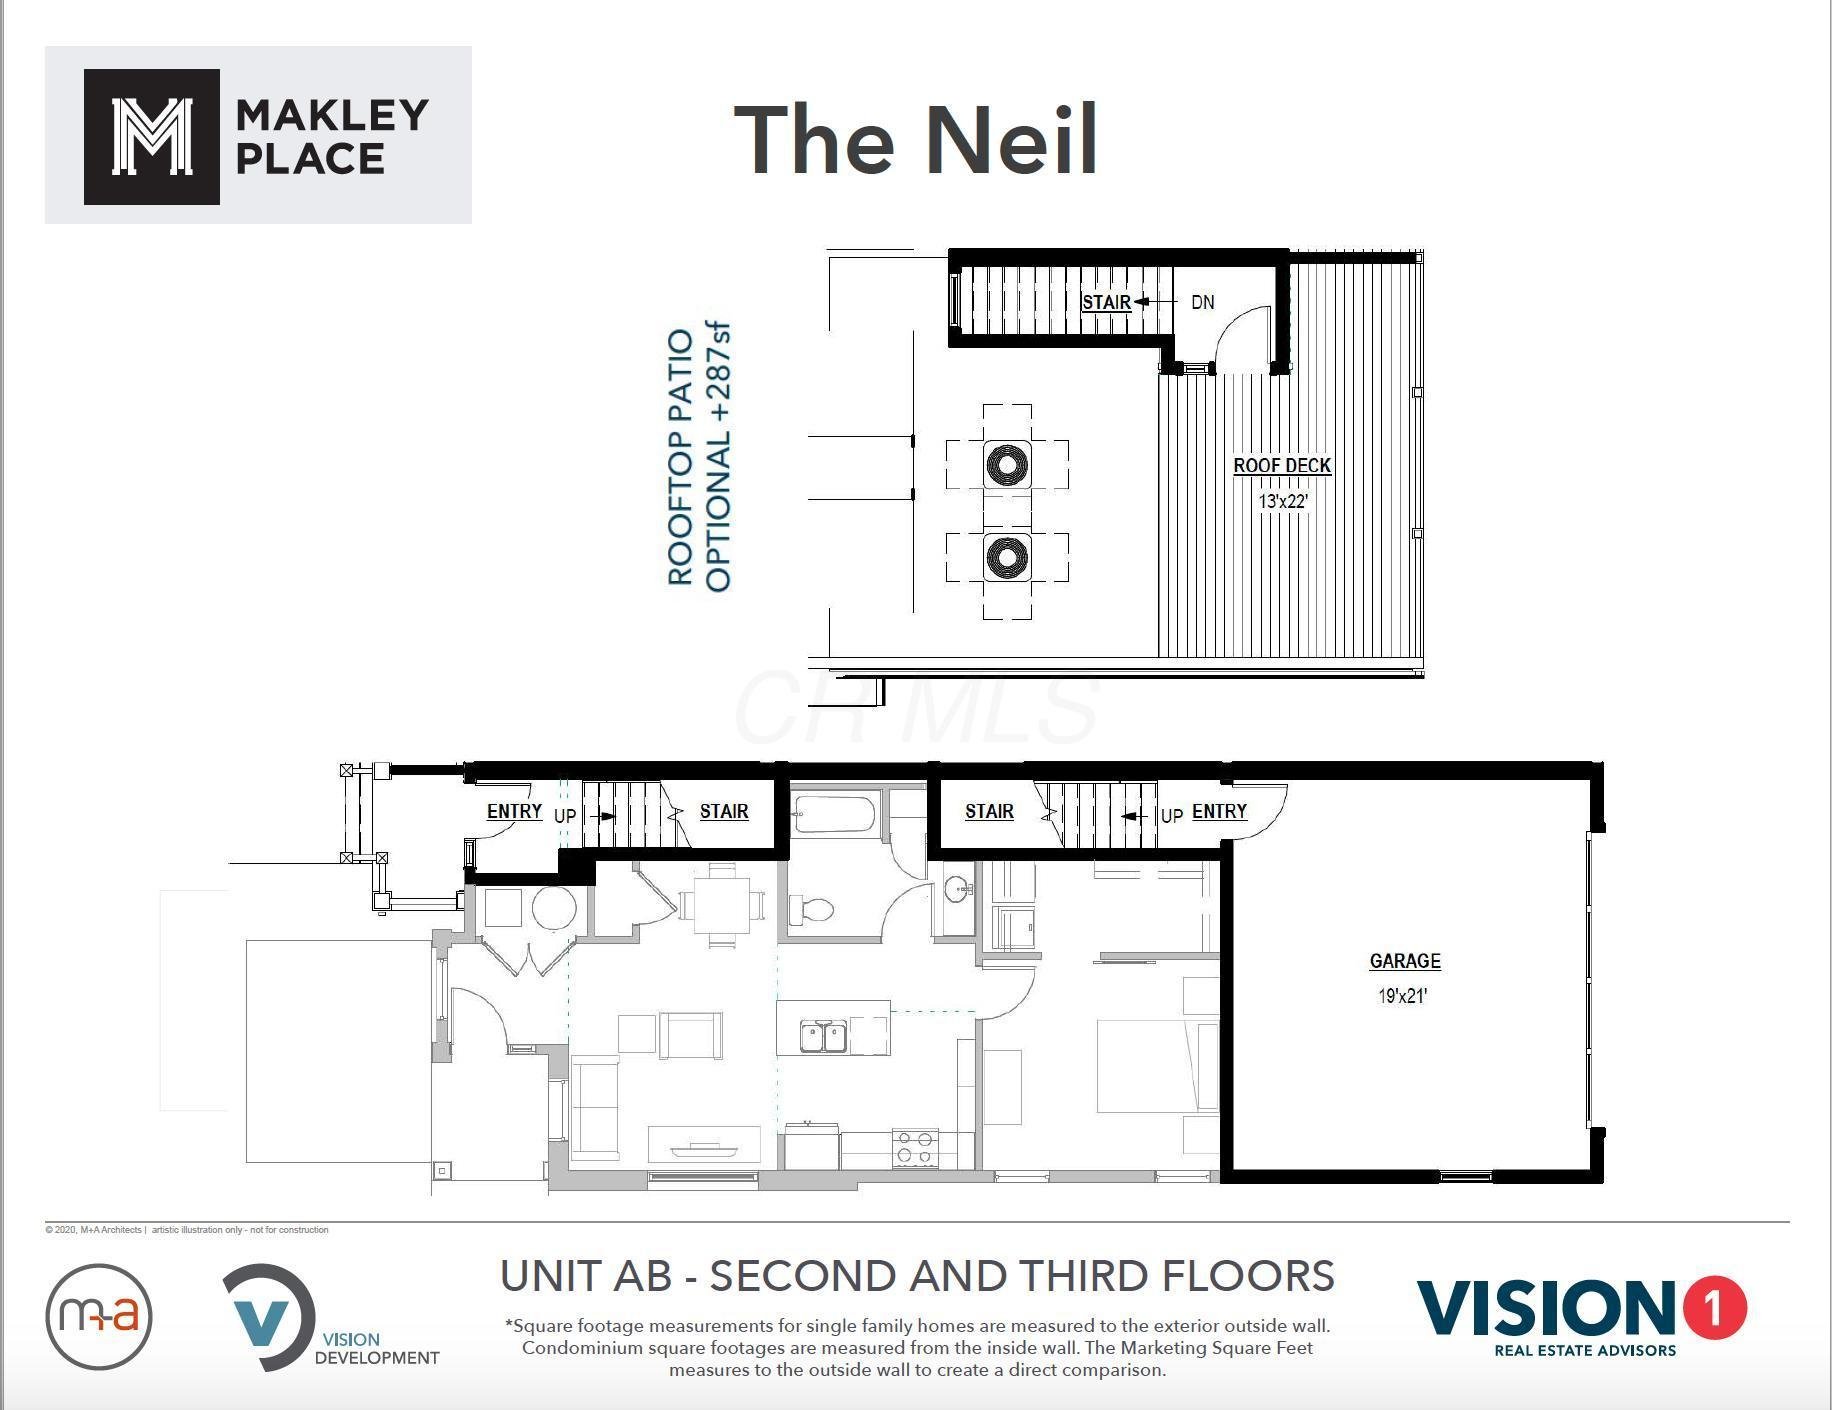 Neil 2 (Dimensions)